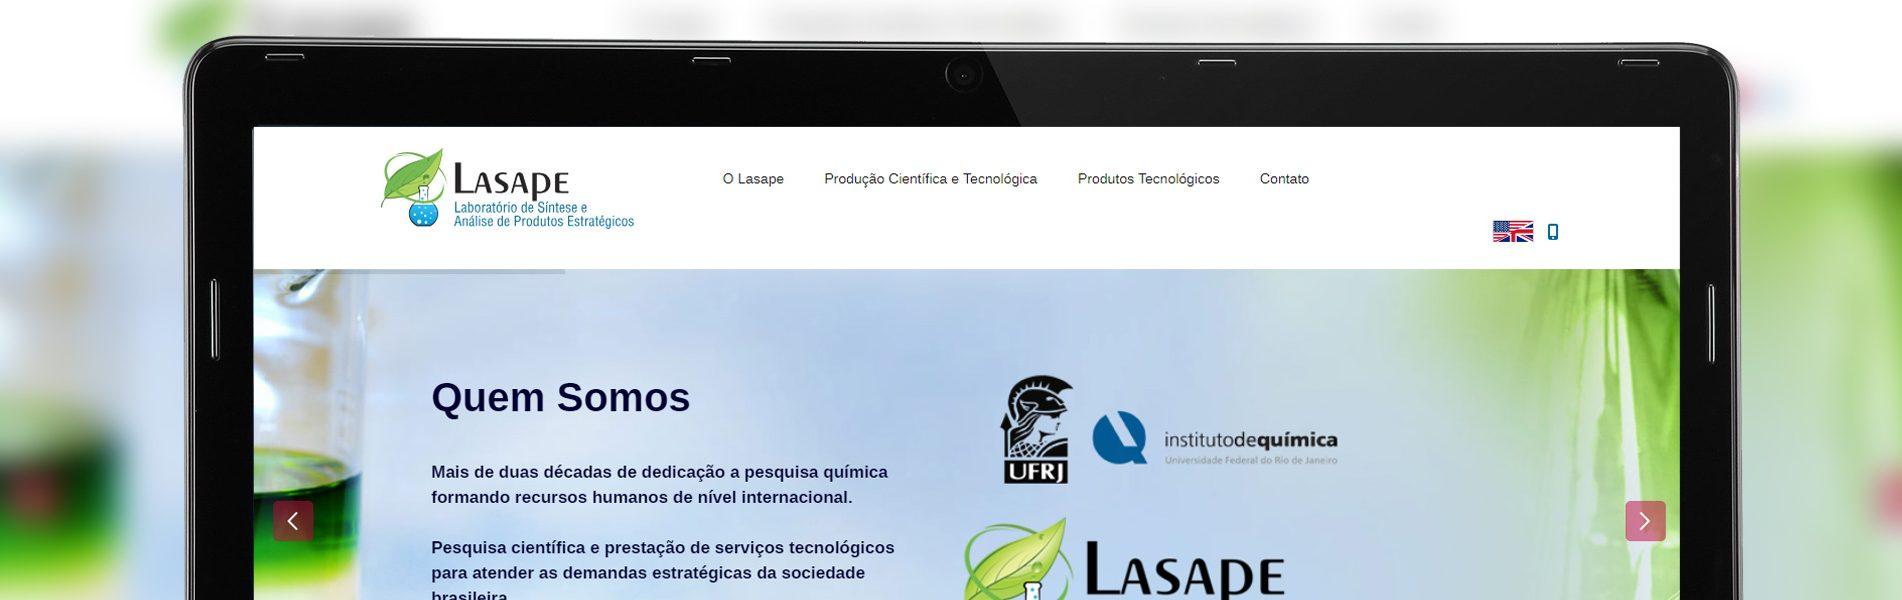 lasape1